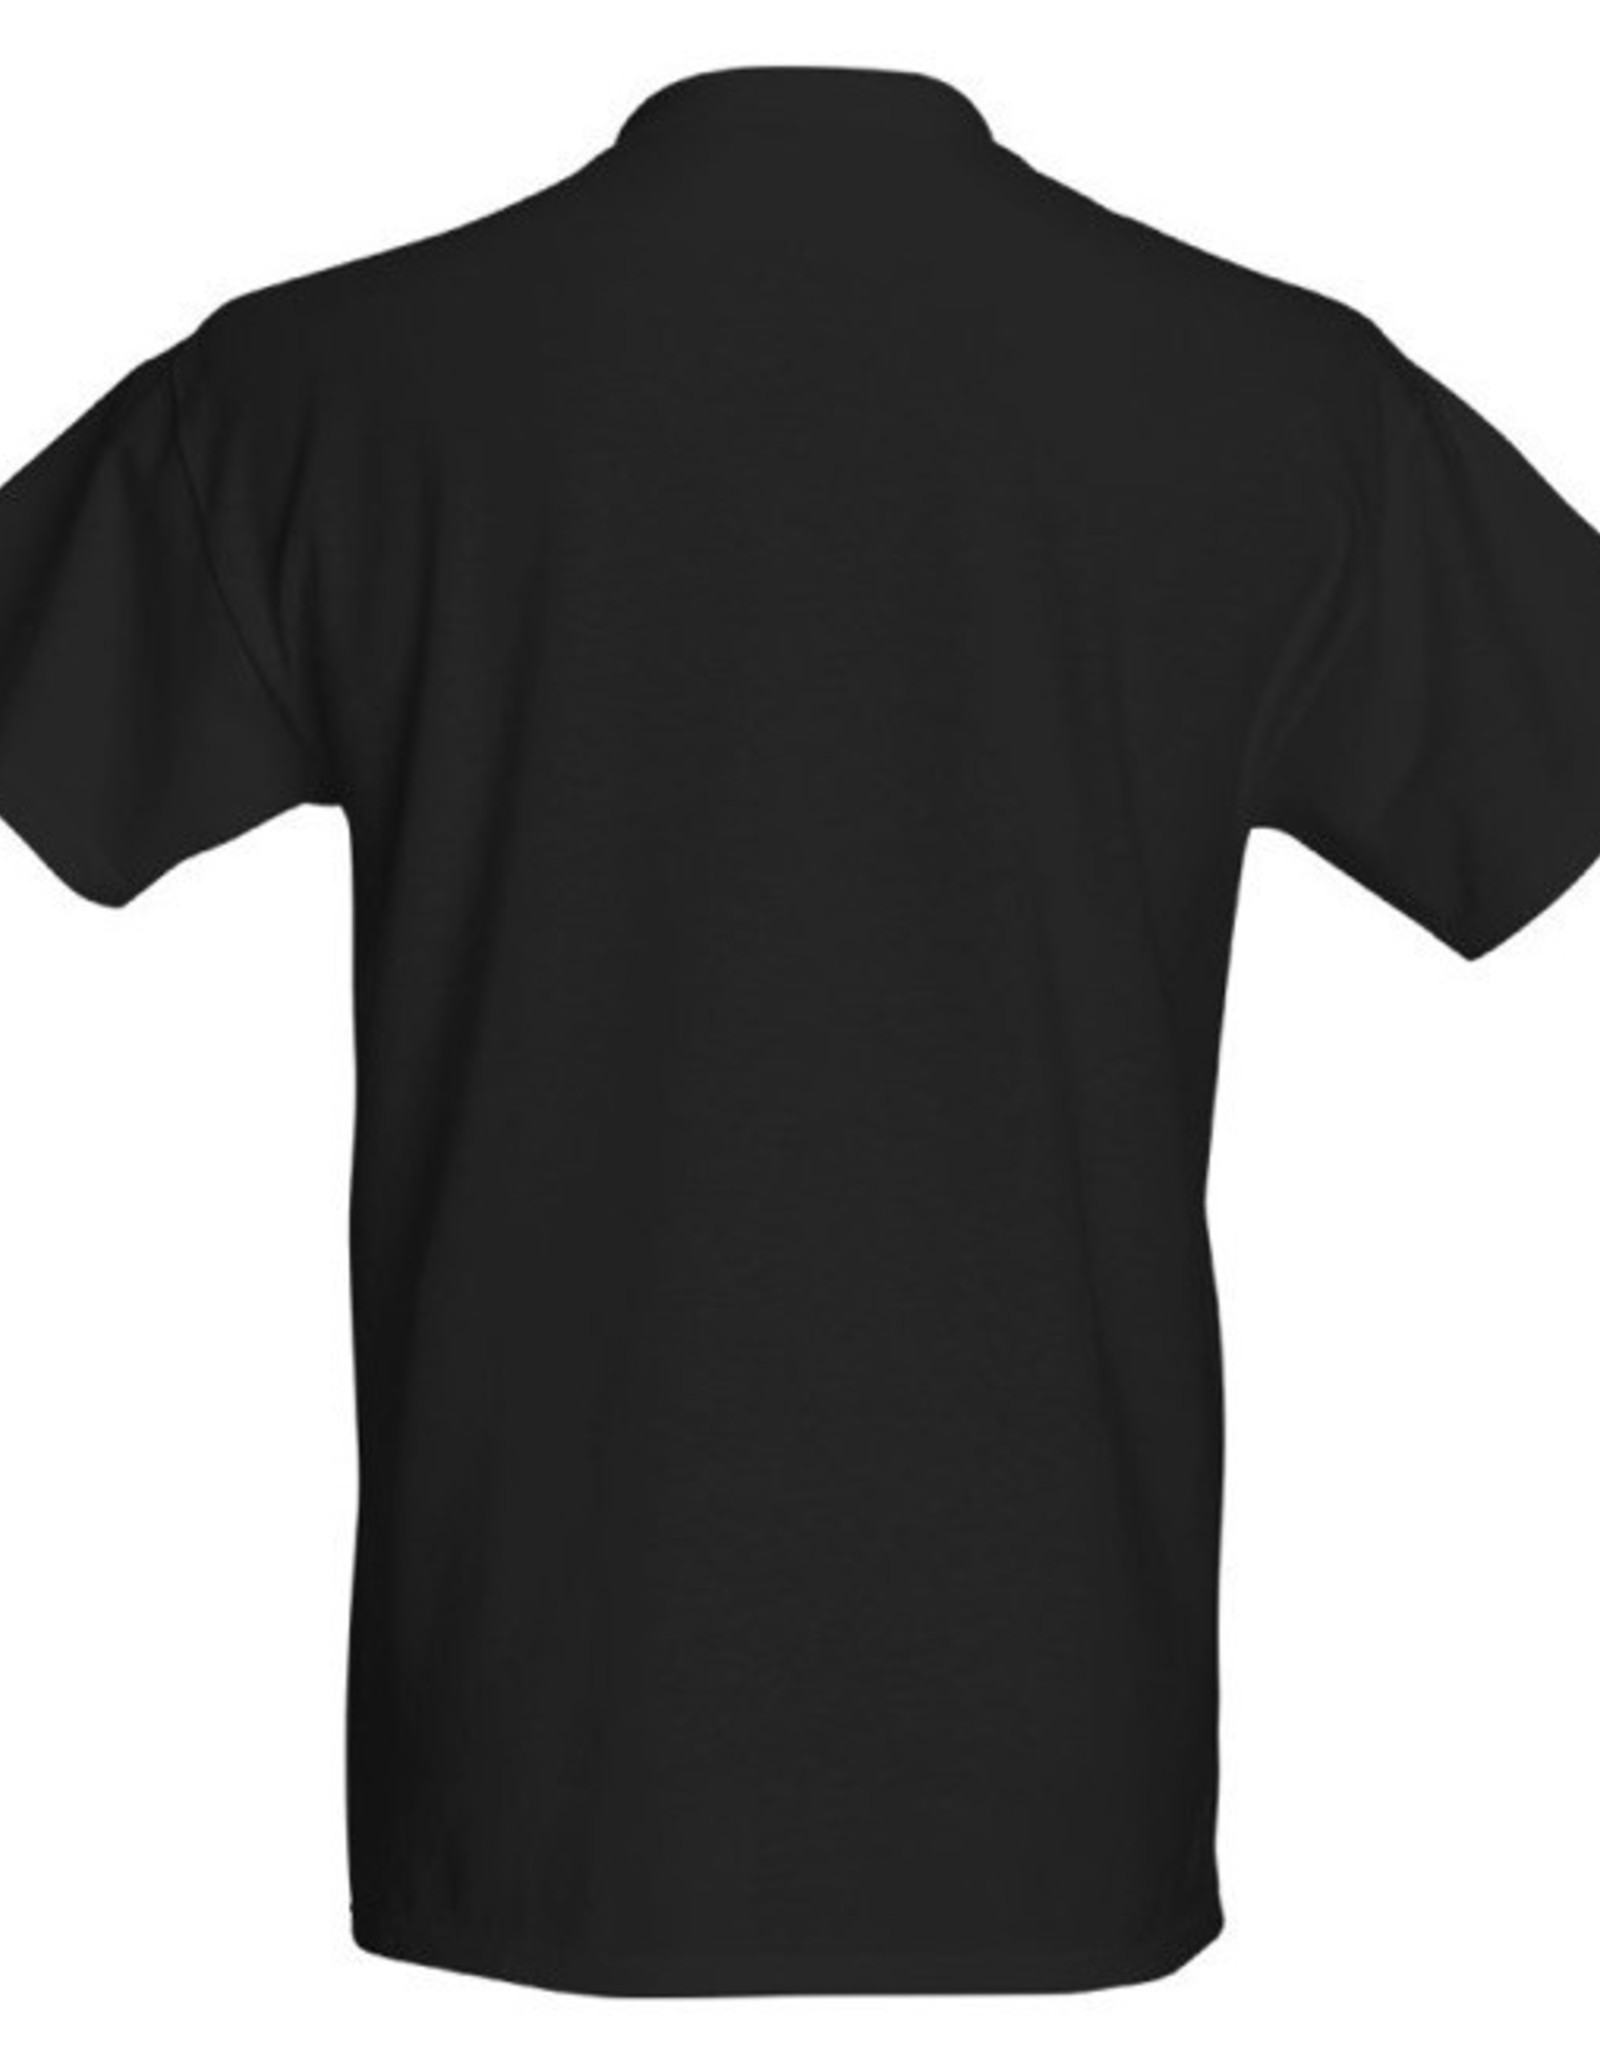 T-Shirt - The Golden Girls, Savage